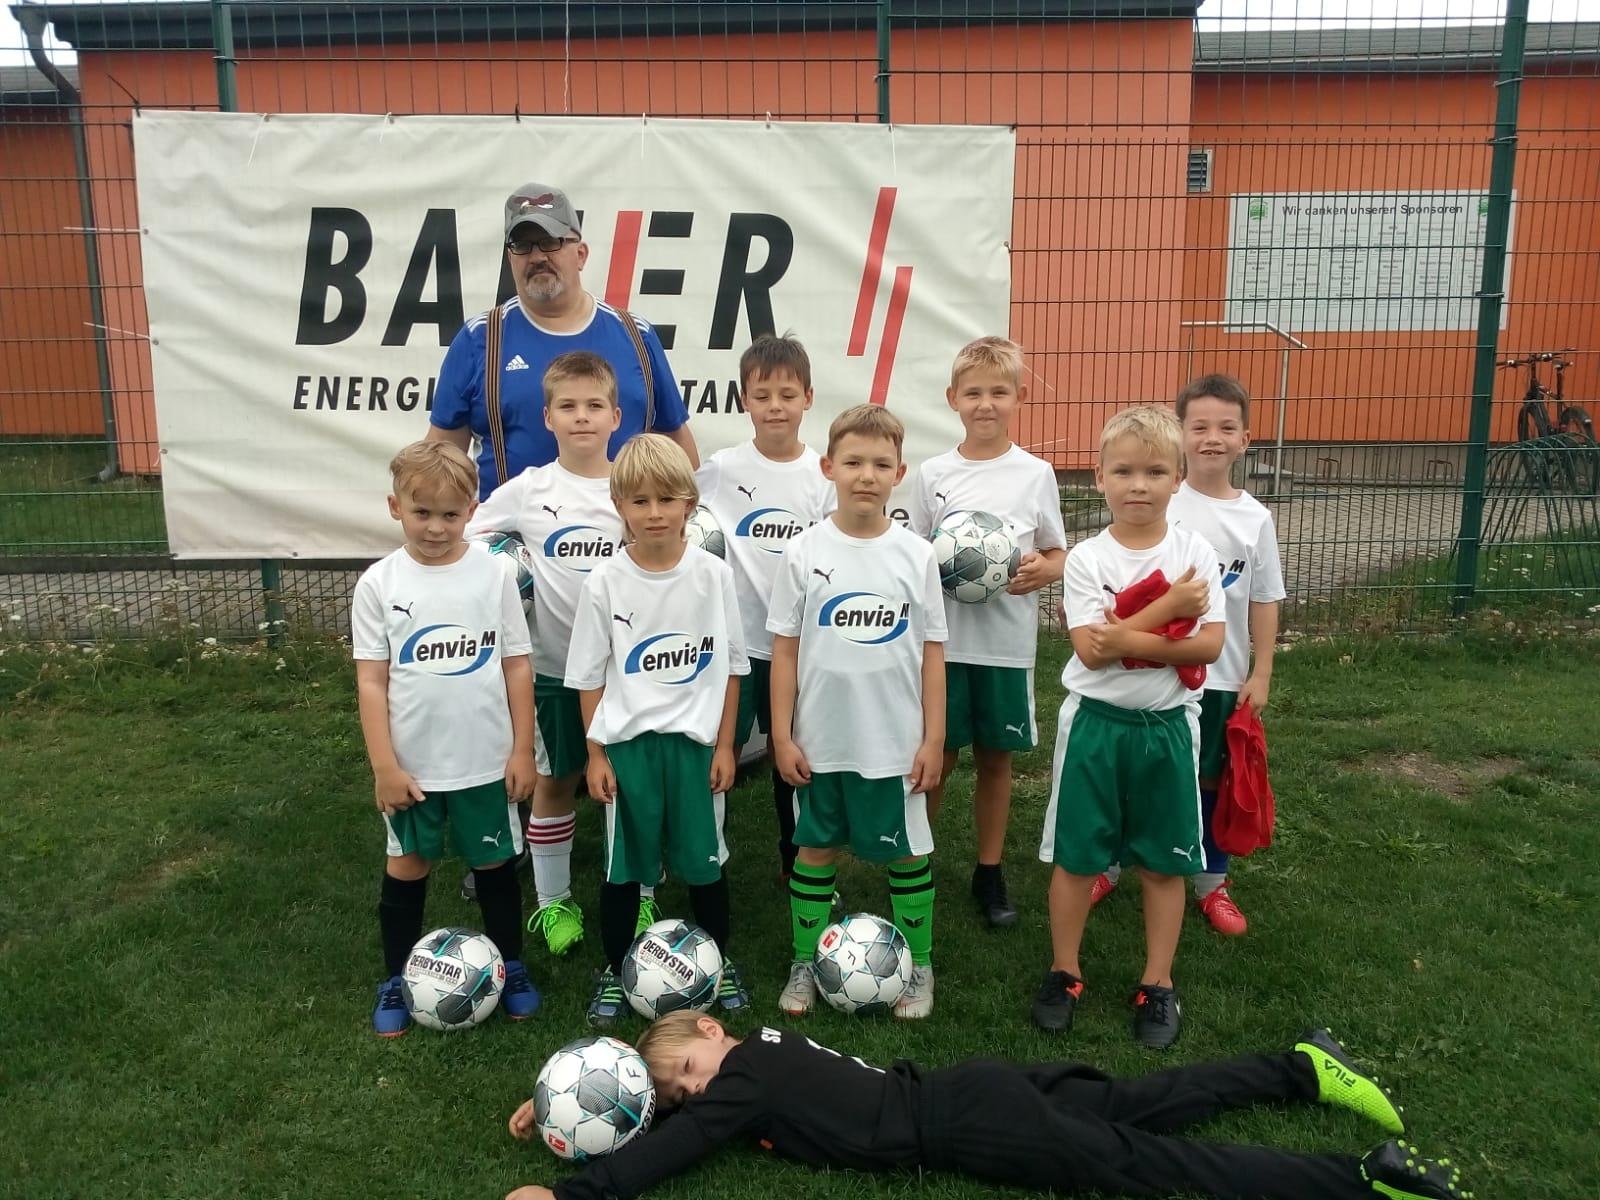 https://www.sv-eiche-wachau.de/wp-content/uploads/2020/09/Fussball_F-Jugend_2020-2021.jpg